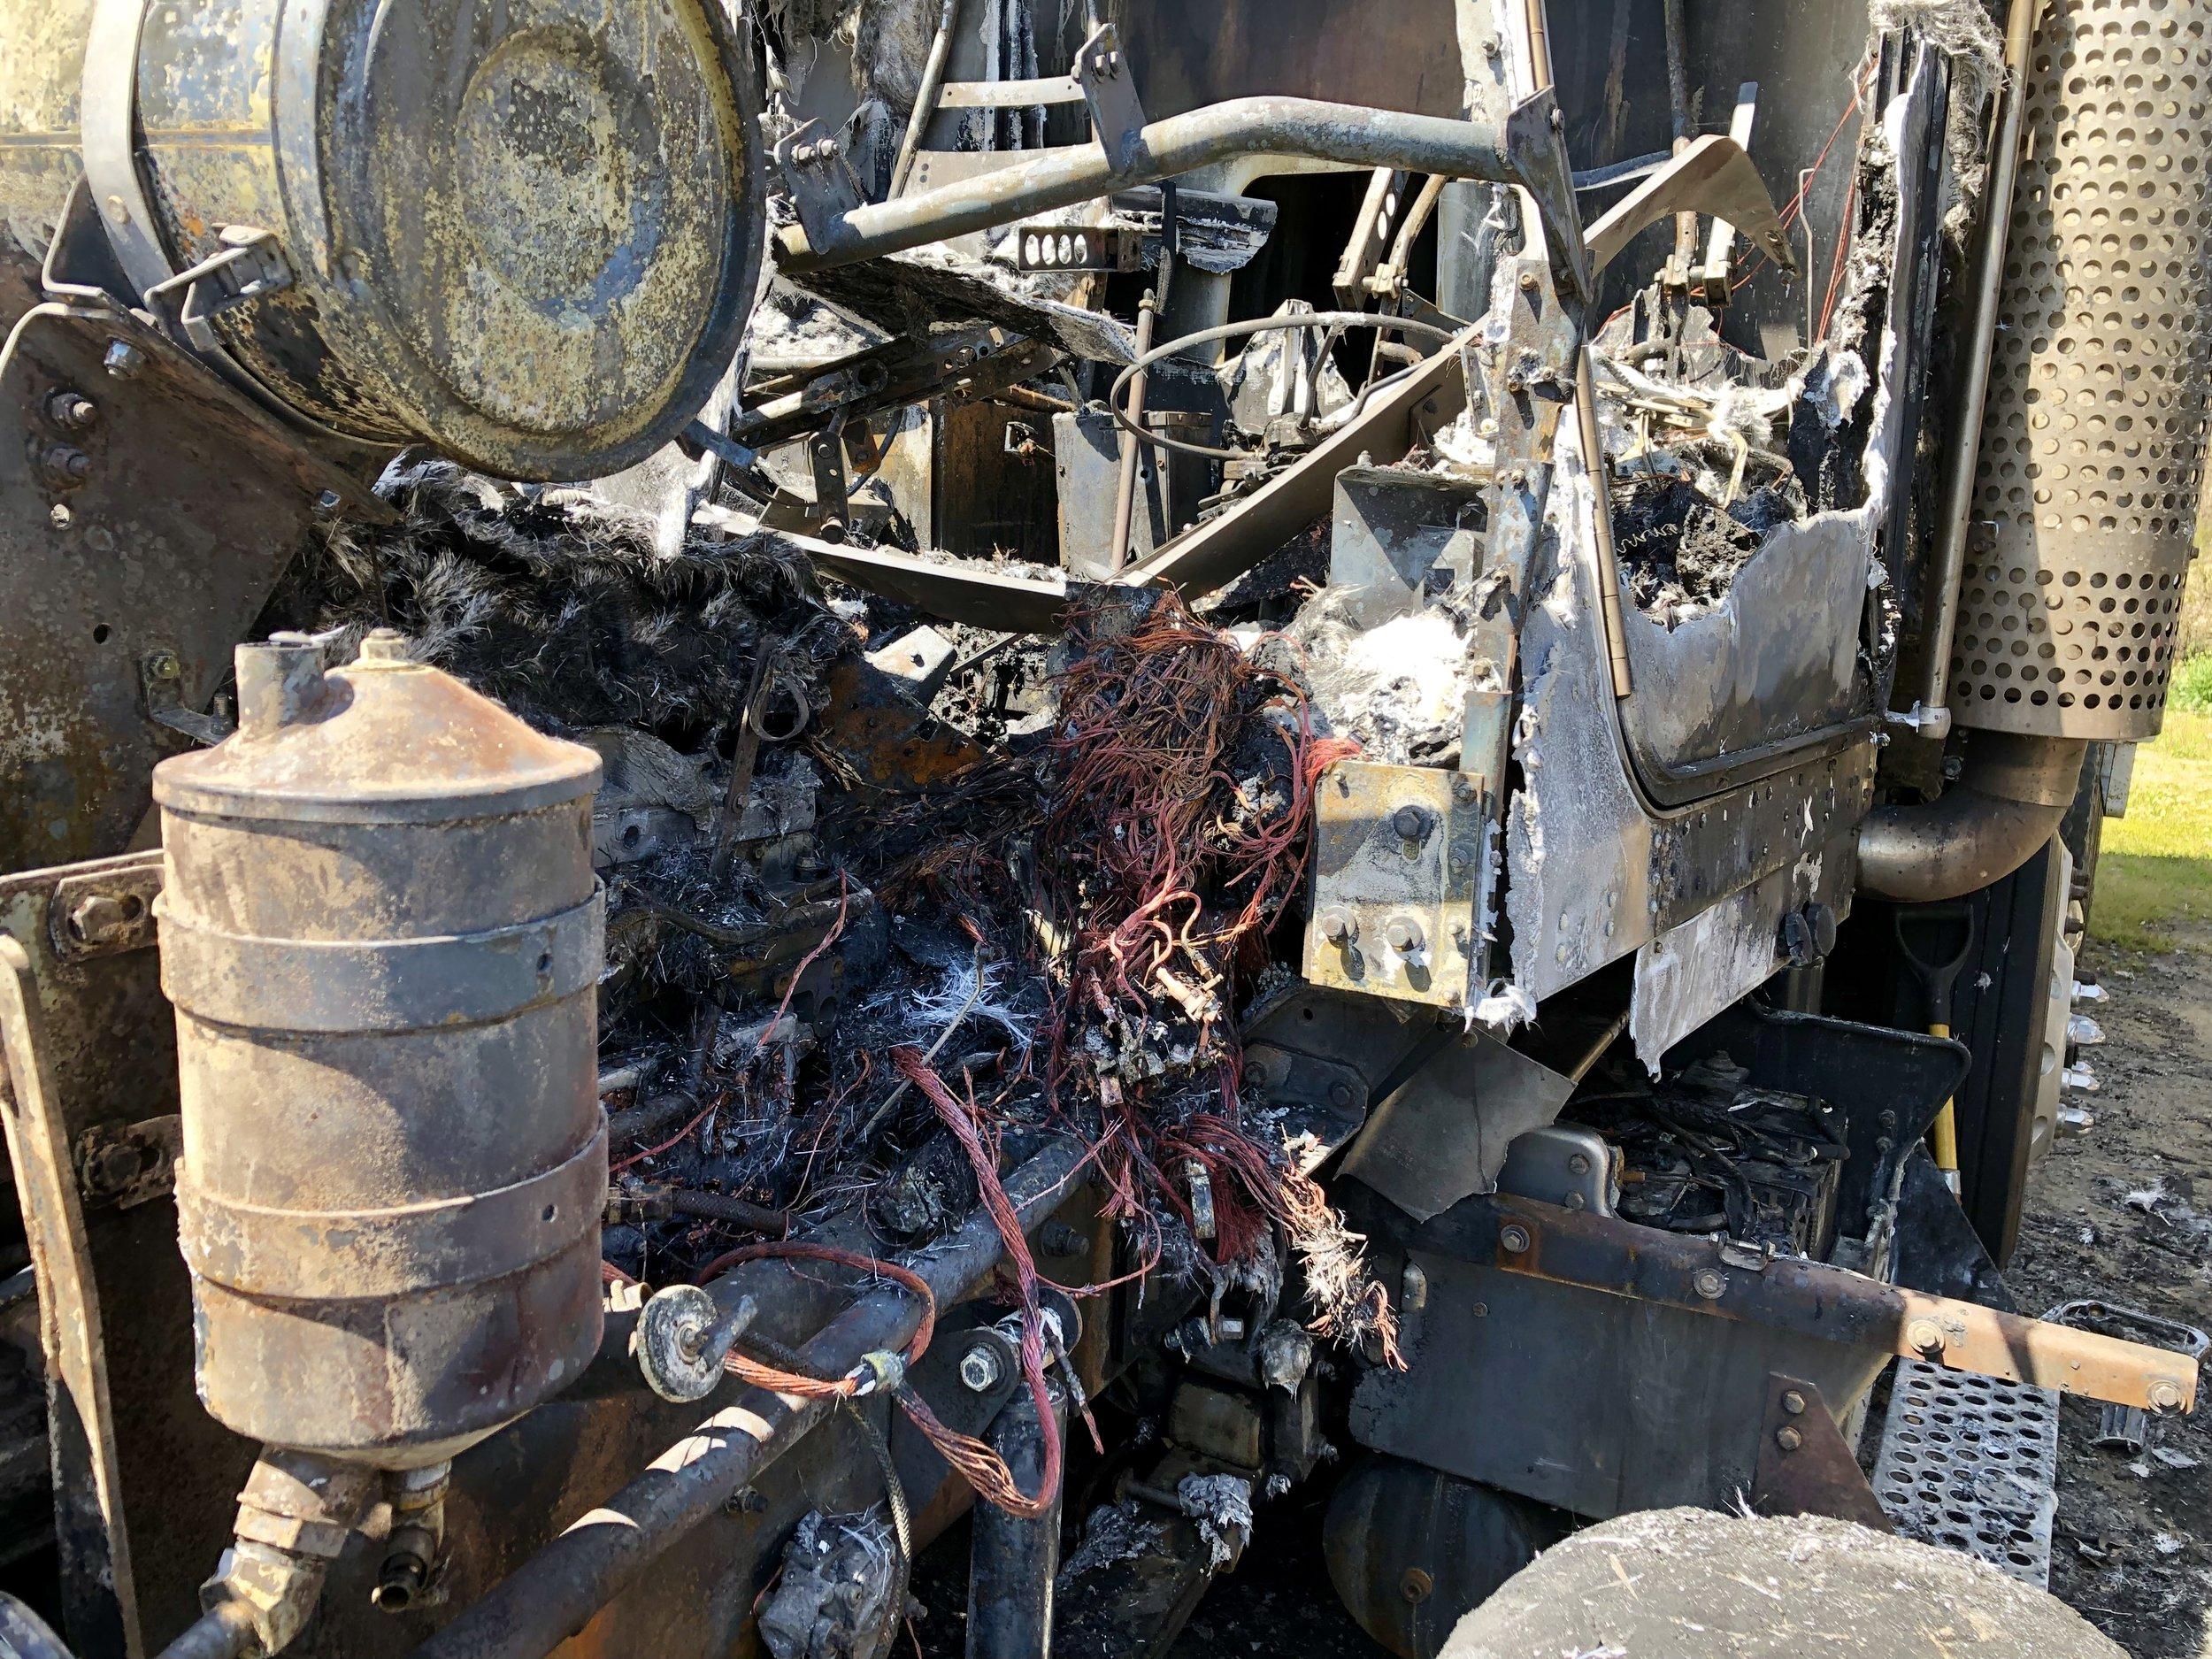 Dump Trucks Catch Fire At Local Business Friday Neuse News